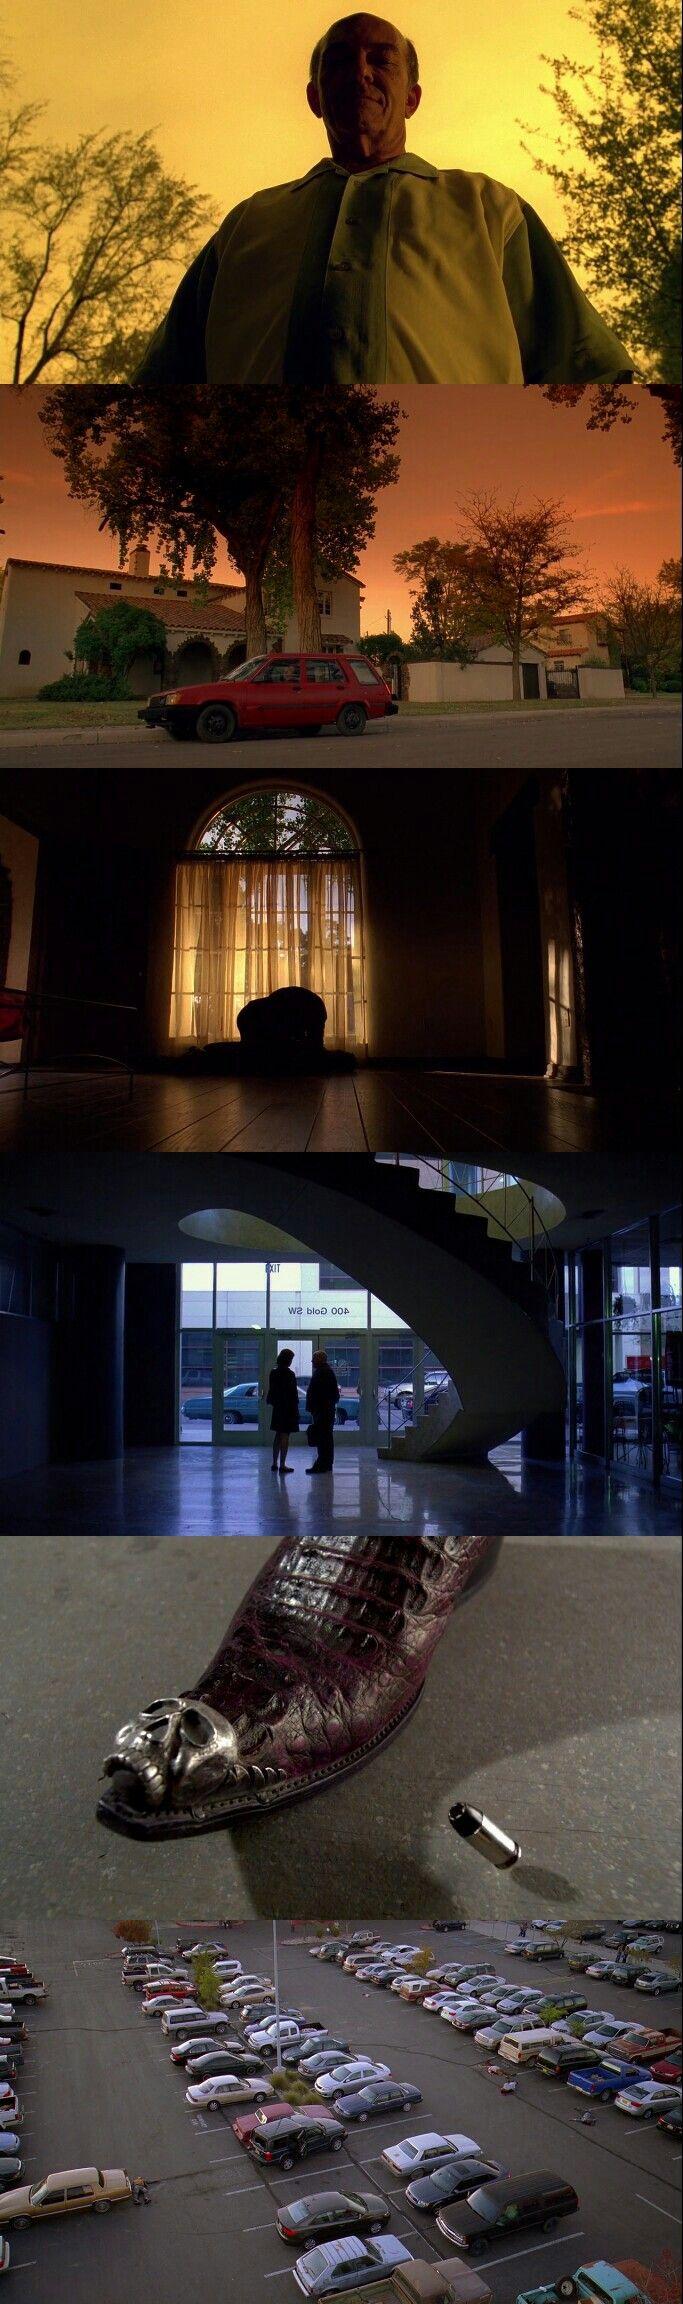 Breaking Bad (2008 - 2013) ● Director(s) - Michelle MacLaren & Others ● Cinematographer(s) - Michael Slovis & Others